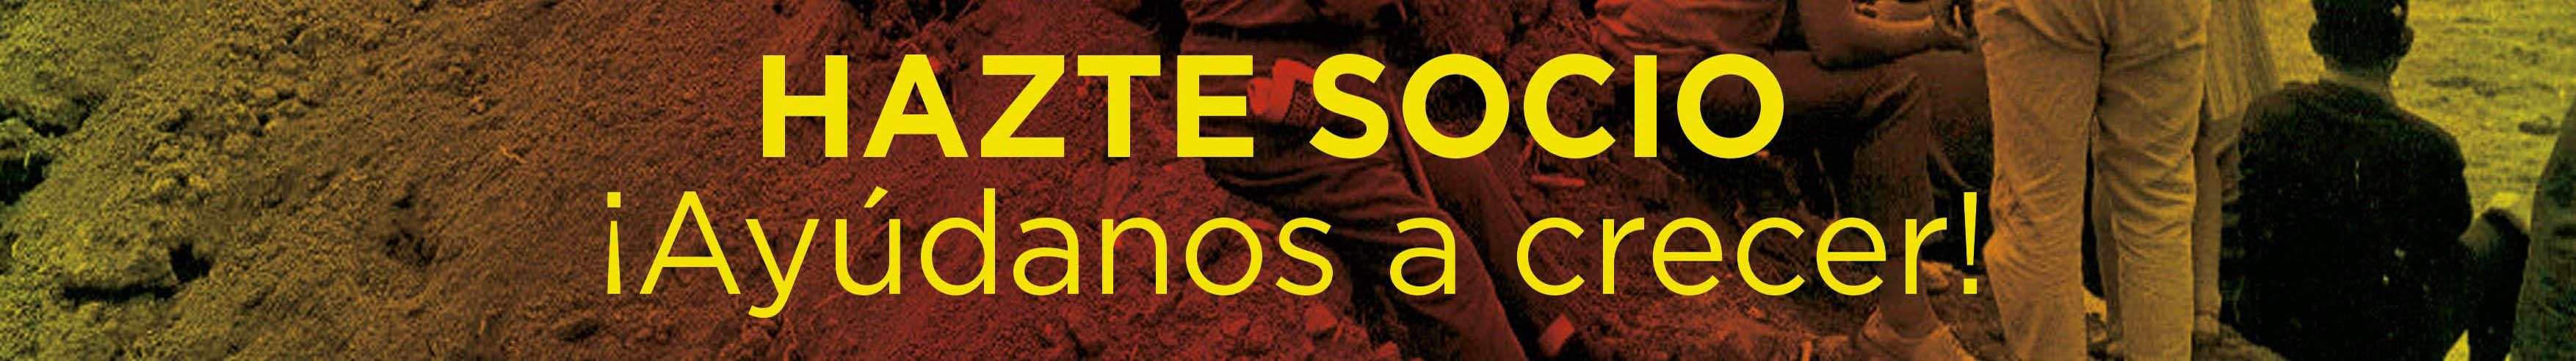 banner-home-hazte_socio